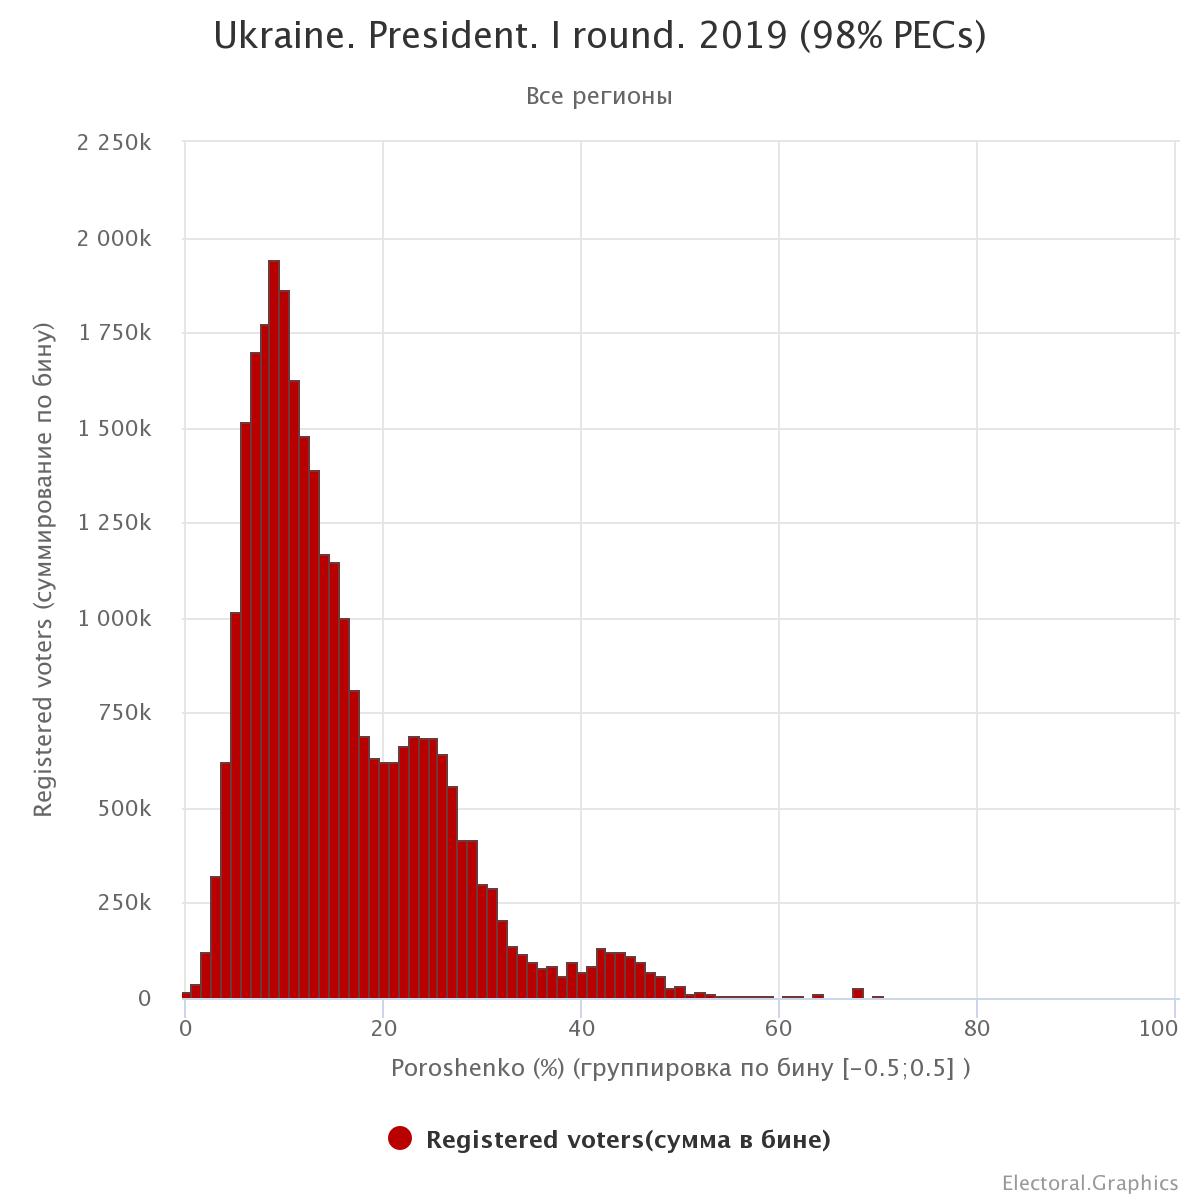 ukraine-president-i-roun (33).png